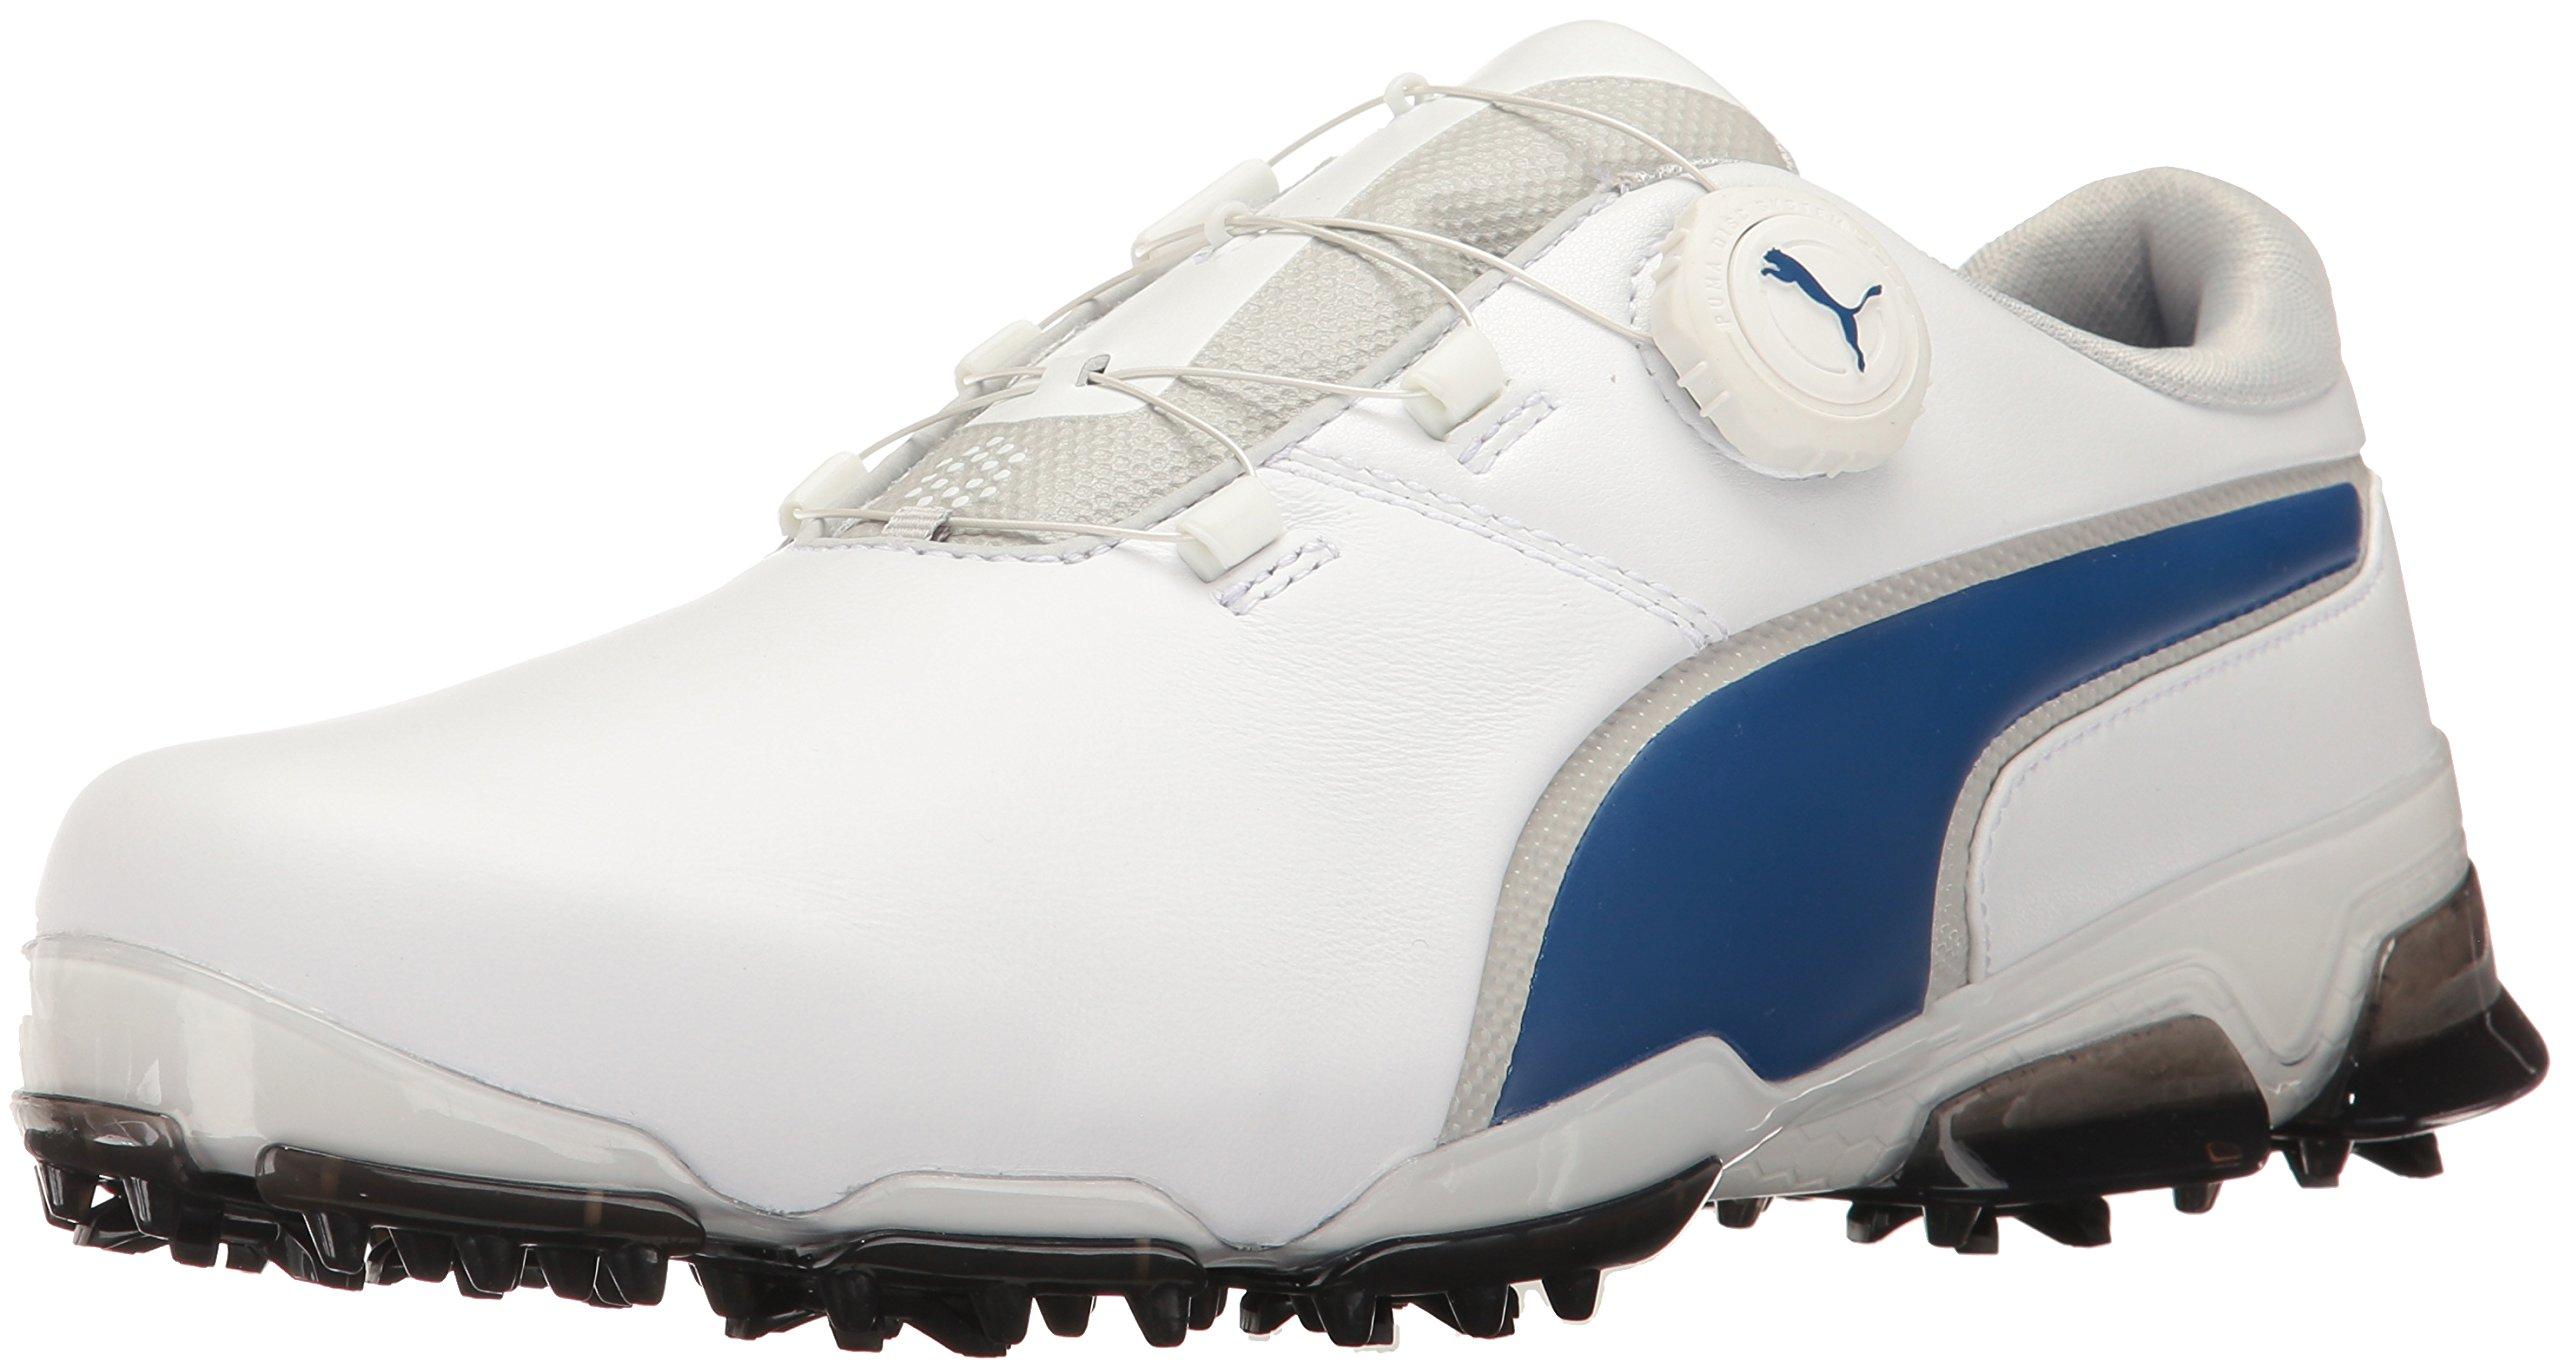 PUMA Men's Titantour Ignite Disc Golf Shoe, White-True Blue, 9 Medium US by PUMA